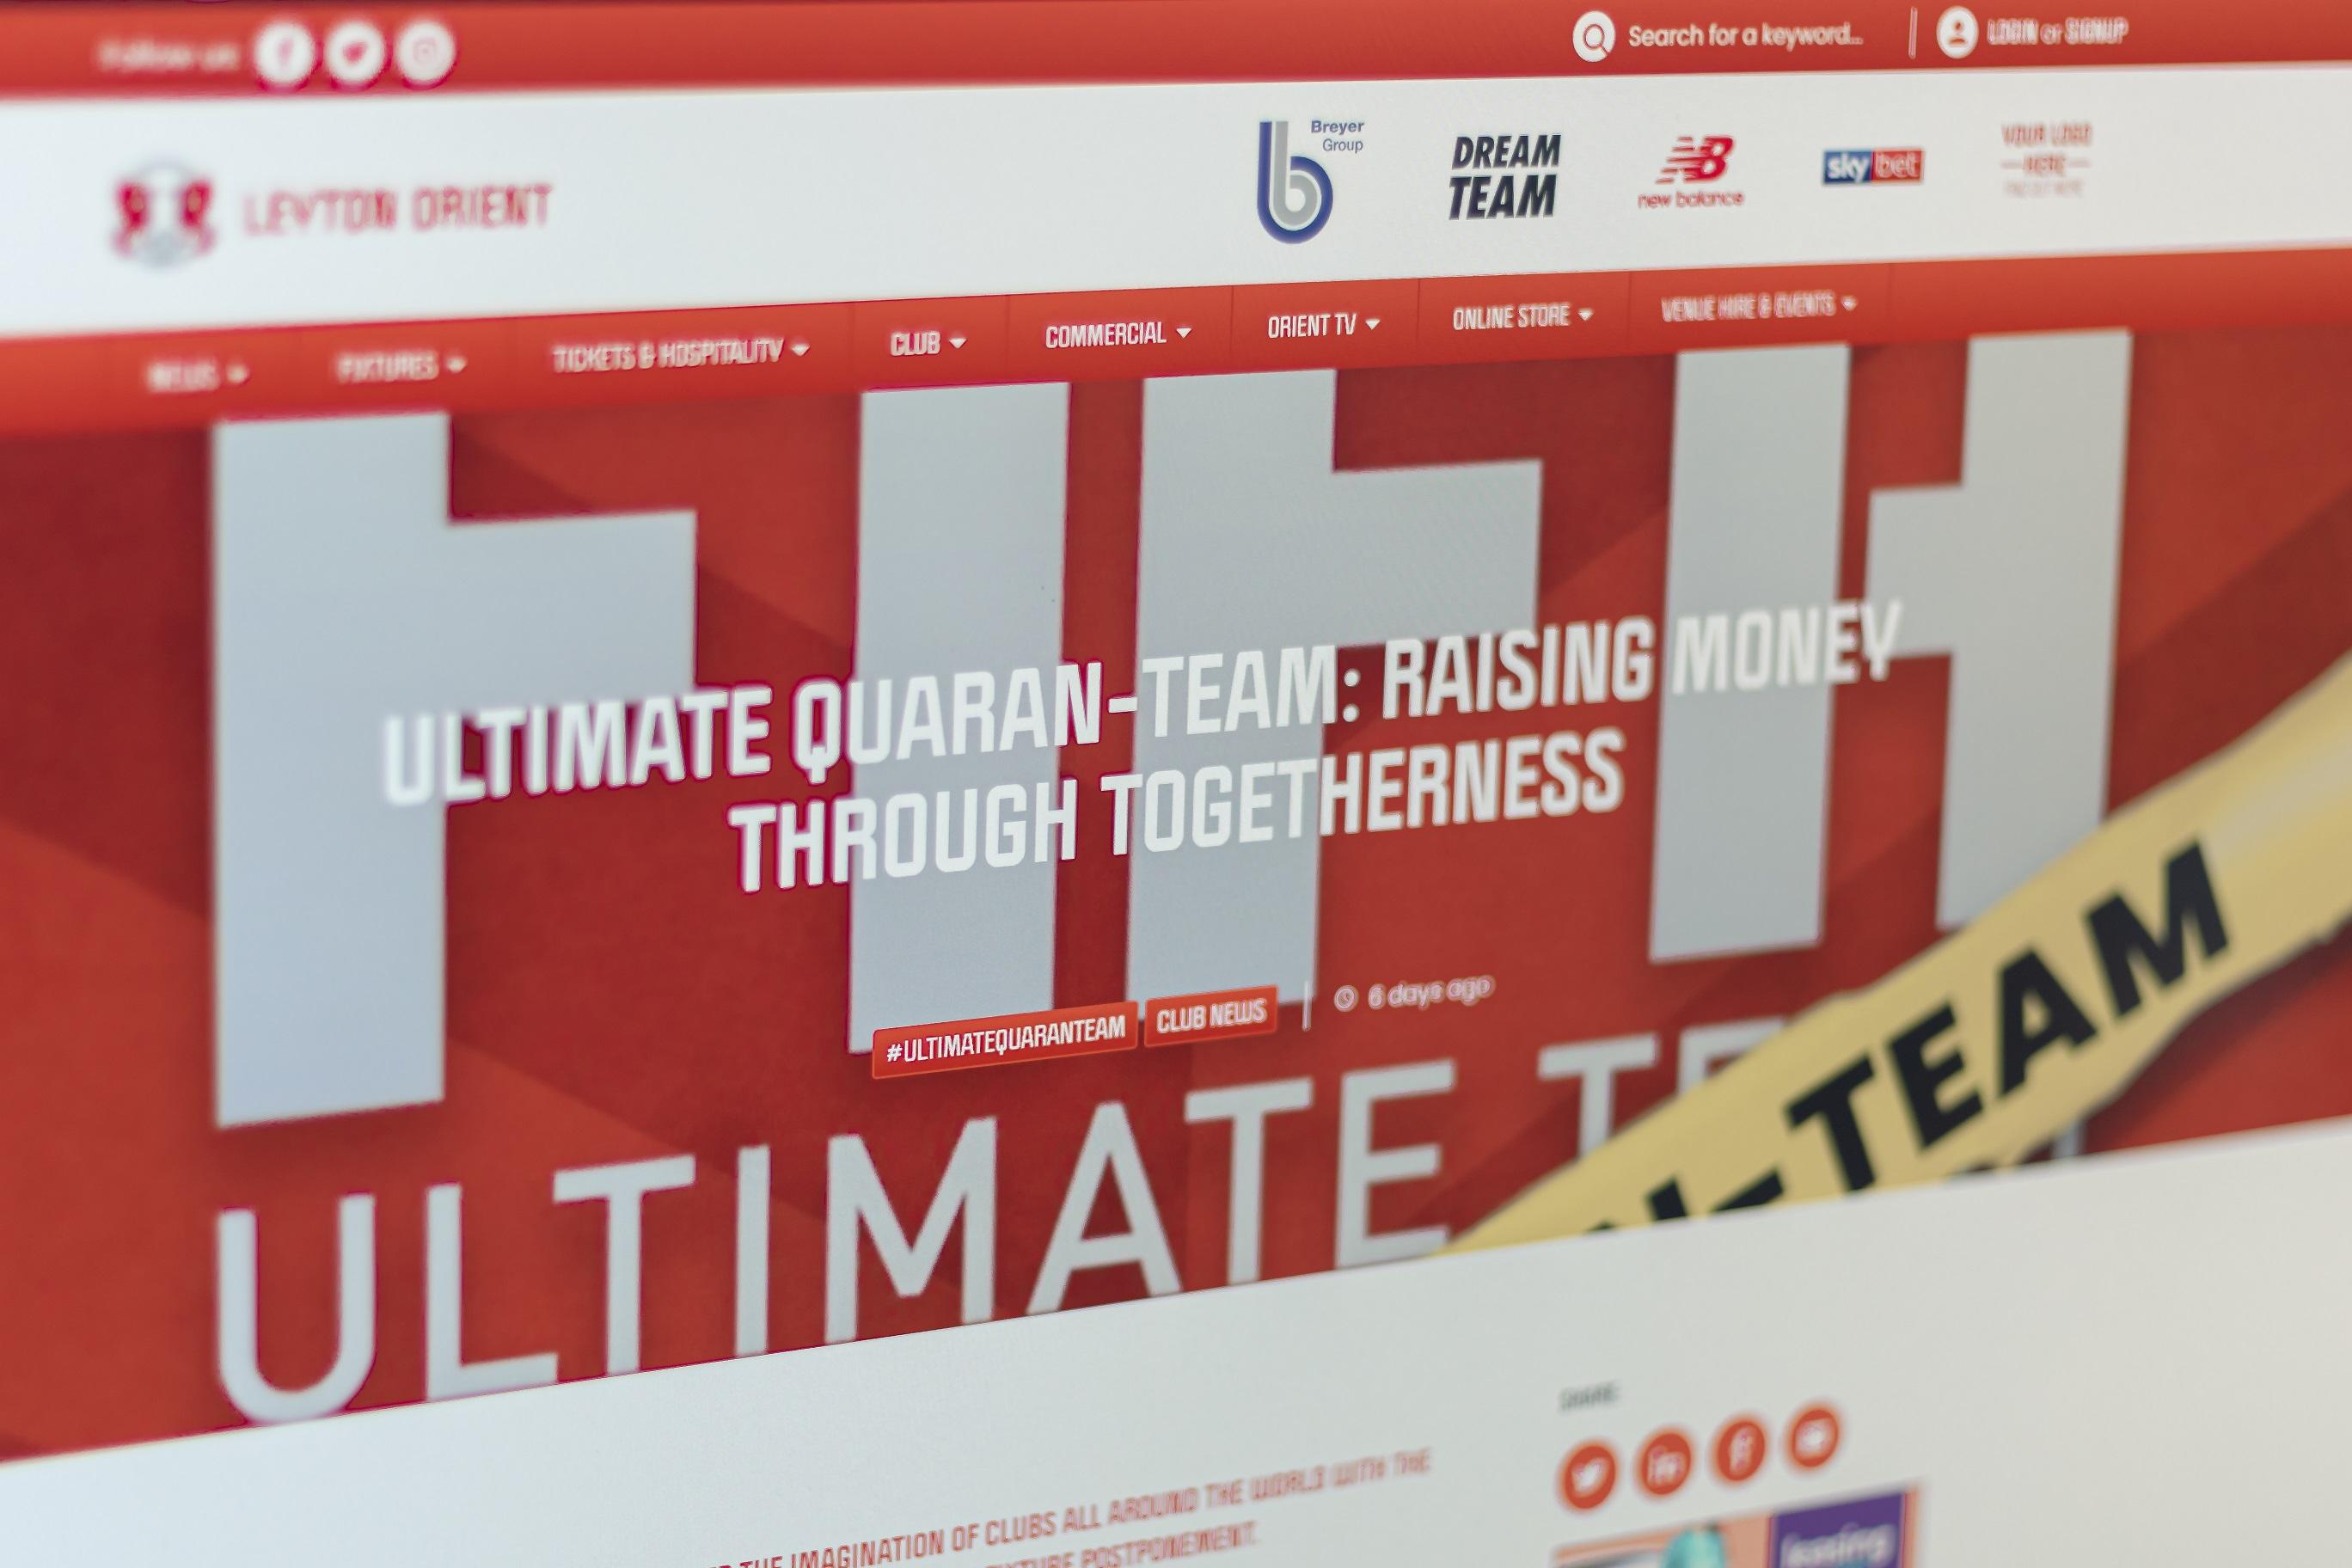 Purpose Media sports platform helps promote massive online FIFA 20 tournament